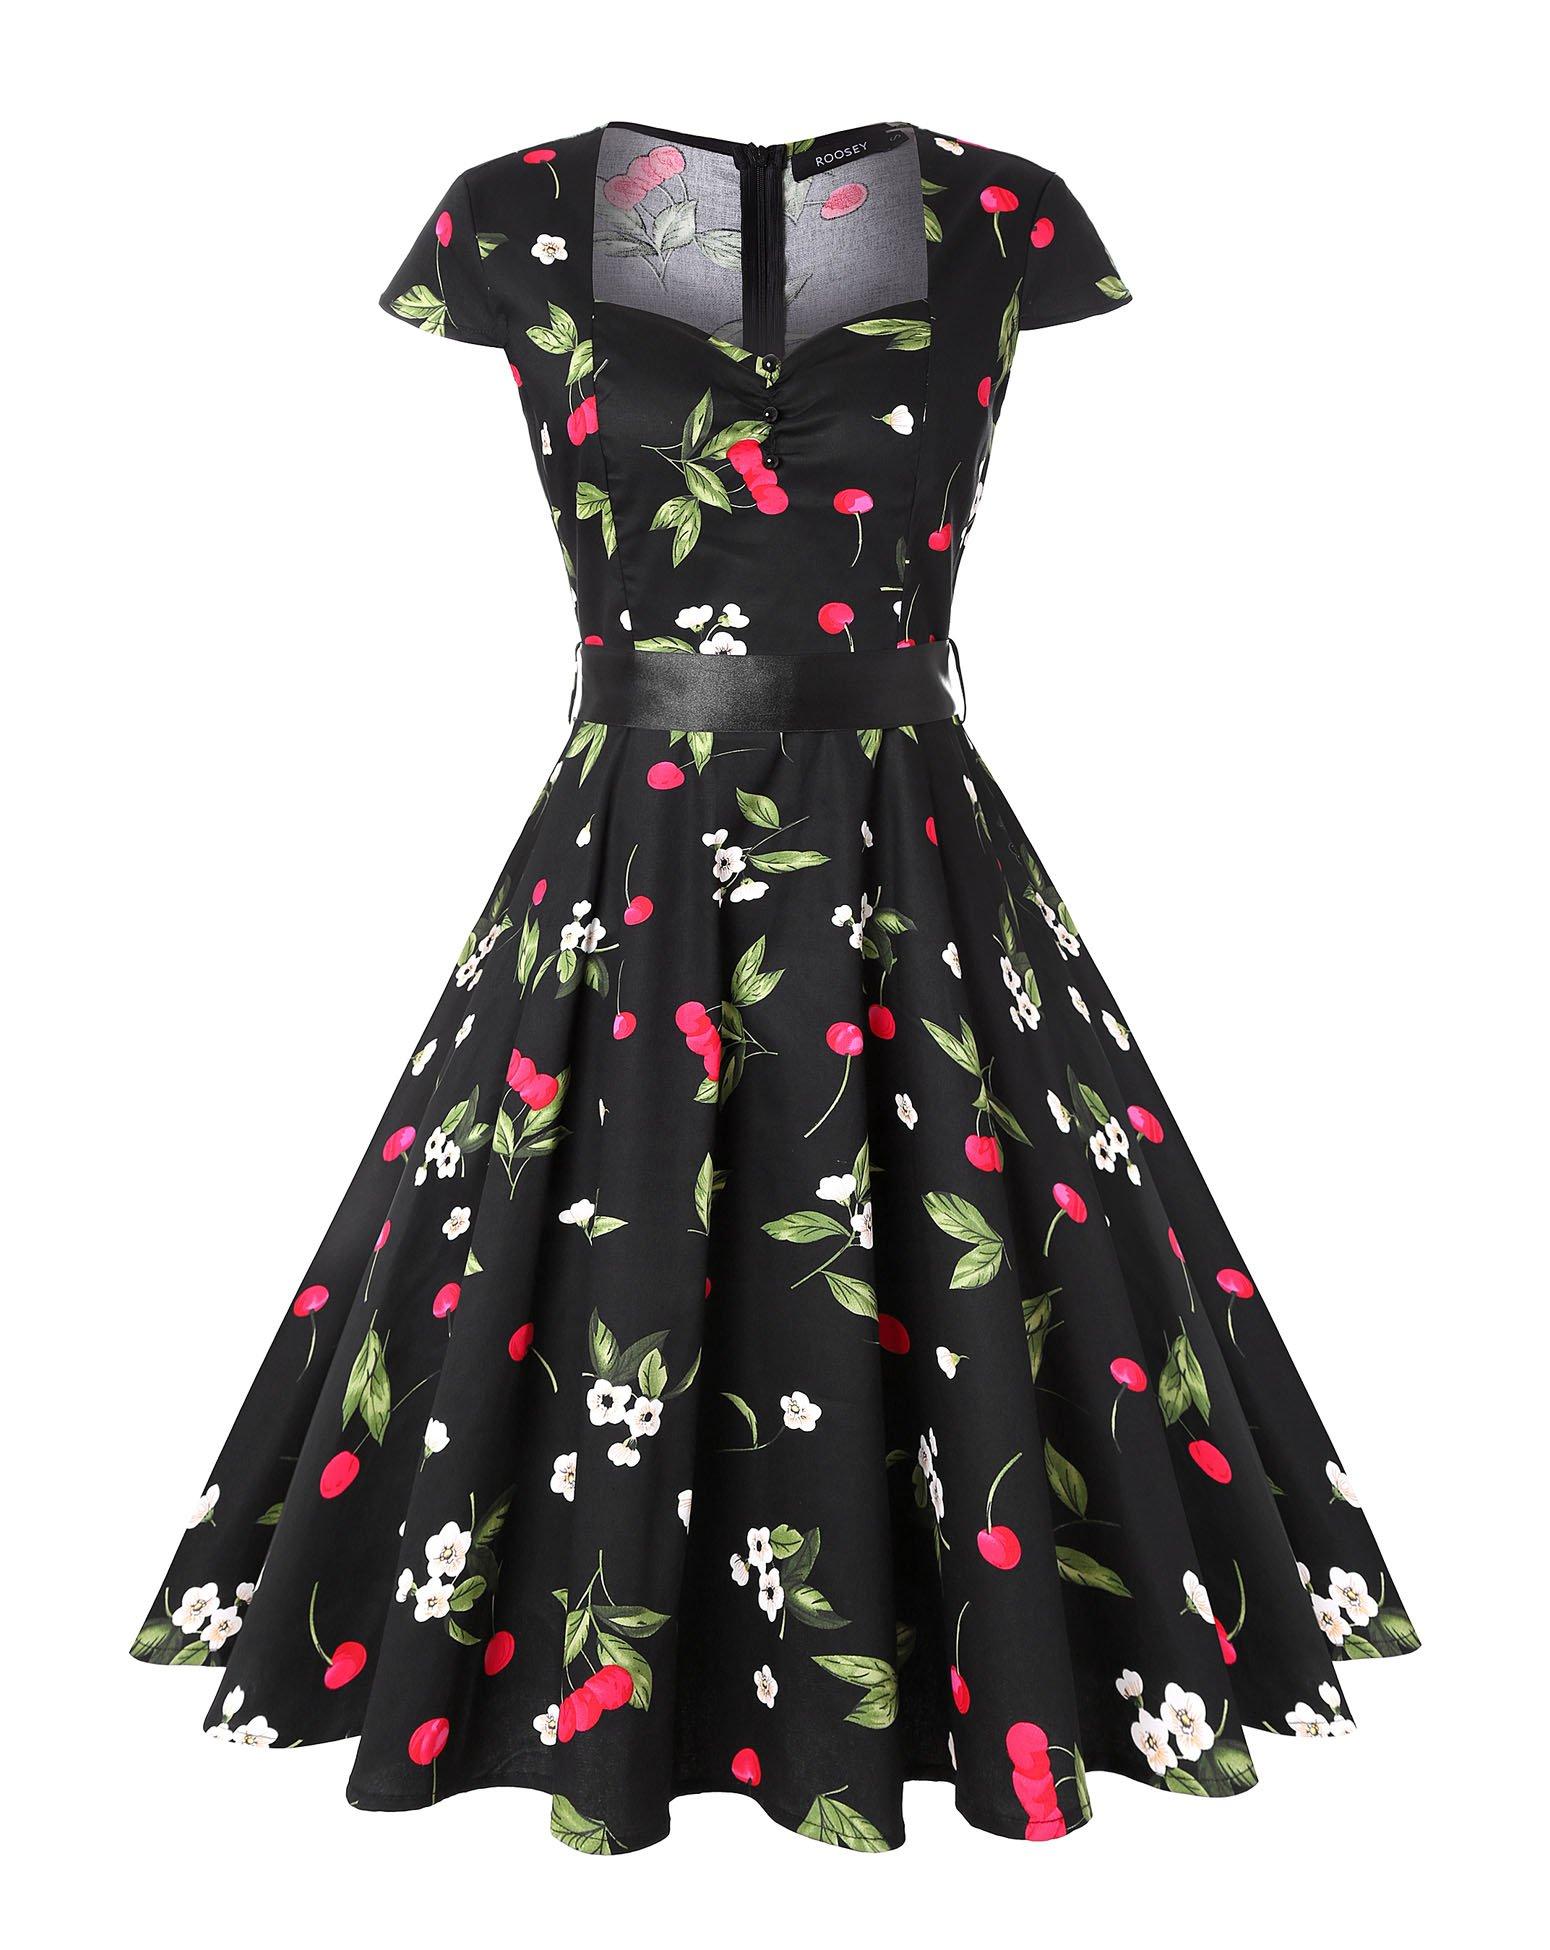 ROOSEY Womens 1950s Retro Rockabilly Swing Knee Length Dress Vintage Cap Sleeves